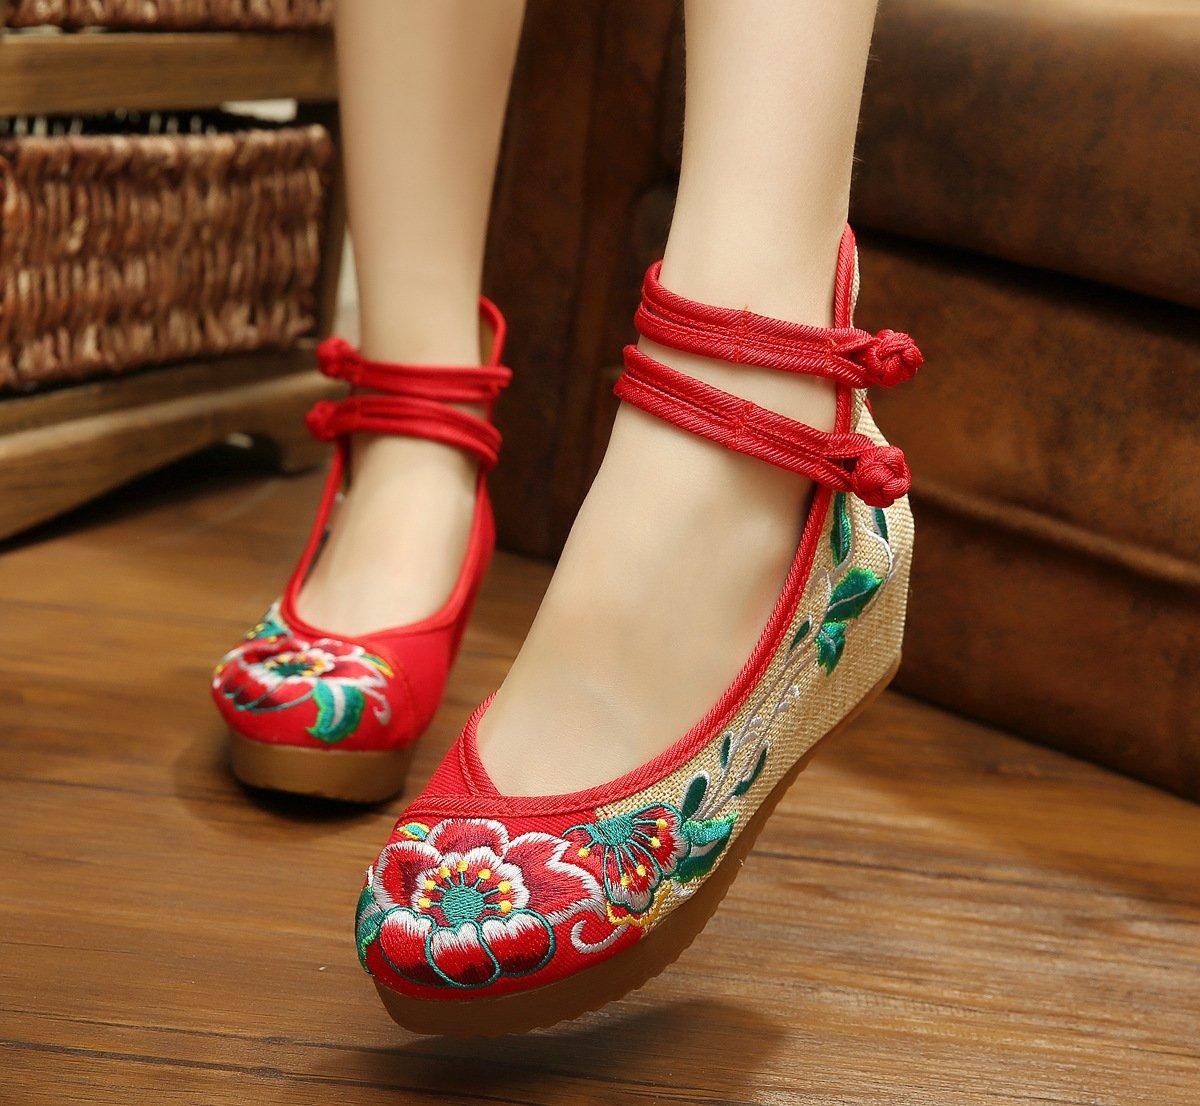 GuiXinWeiHeng xiuhuaxie (new)-Gestickte Schuhe, Leinen, Sehnensohle, ethnischer Stil, erh?hte weibliche Schuhe, Mode, bequem, l?ssig, red, 36